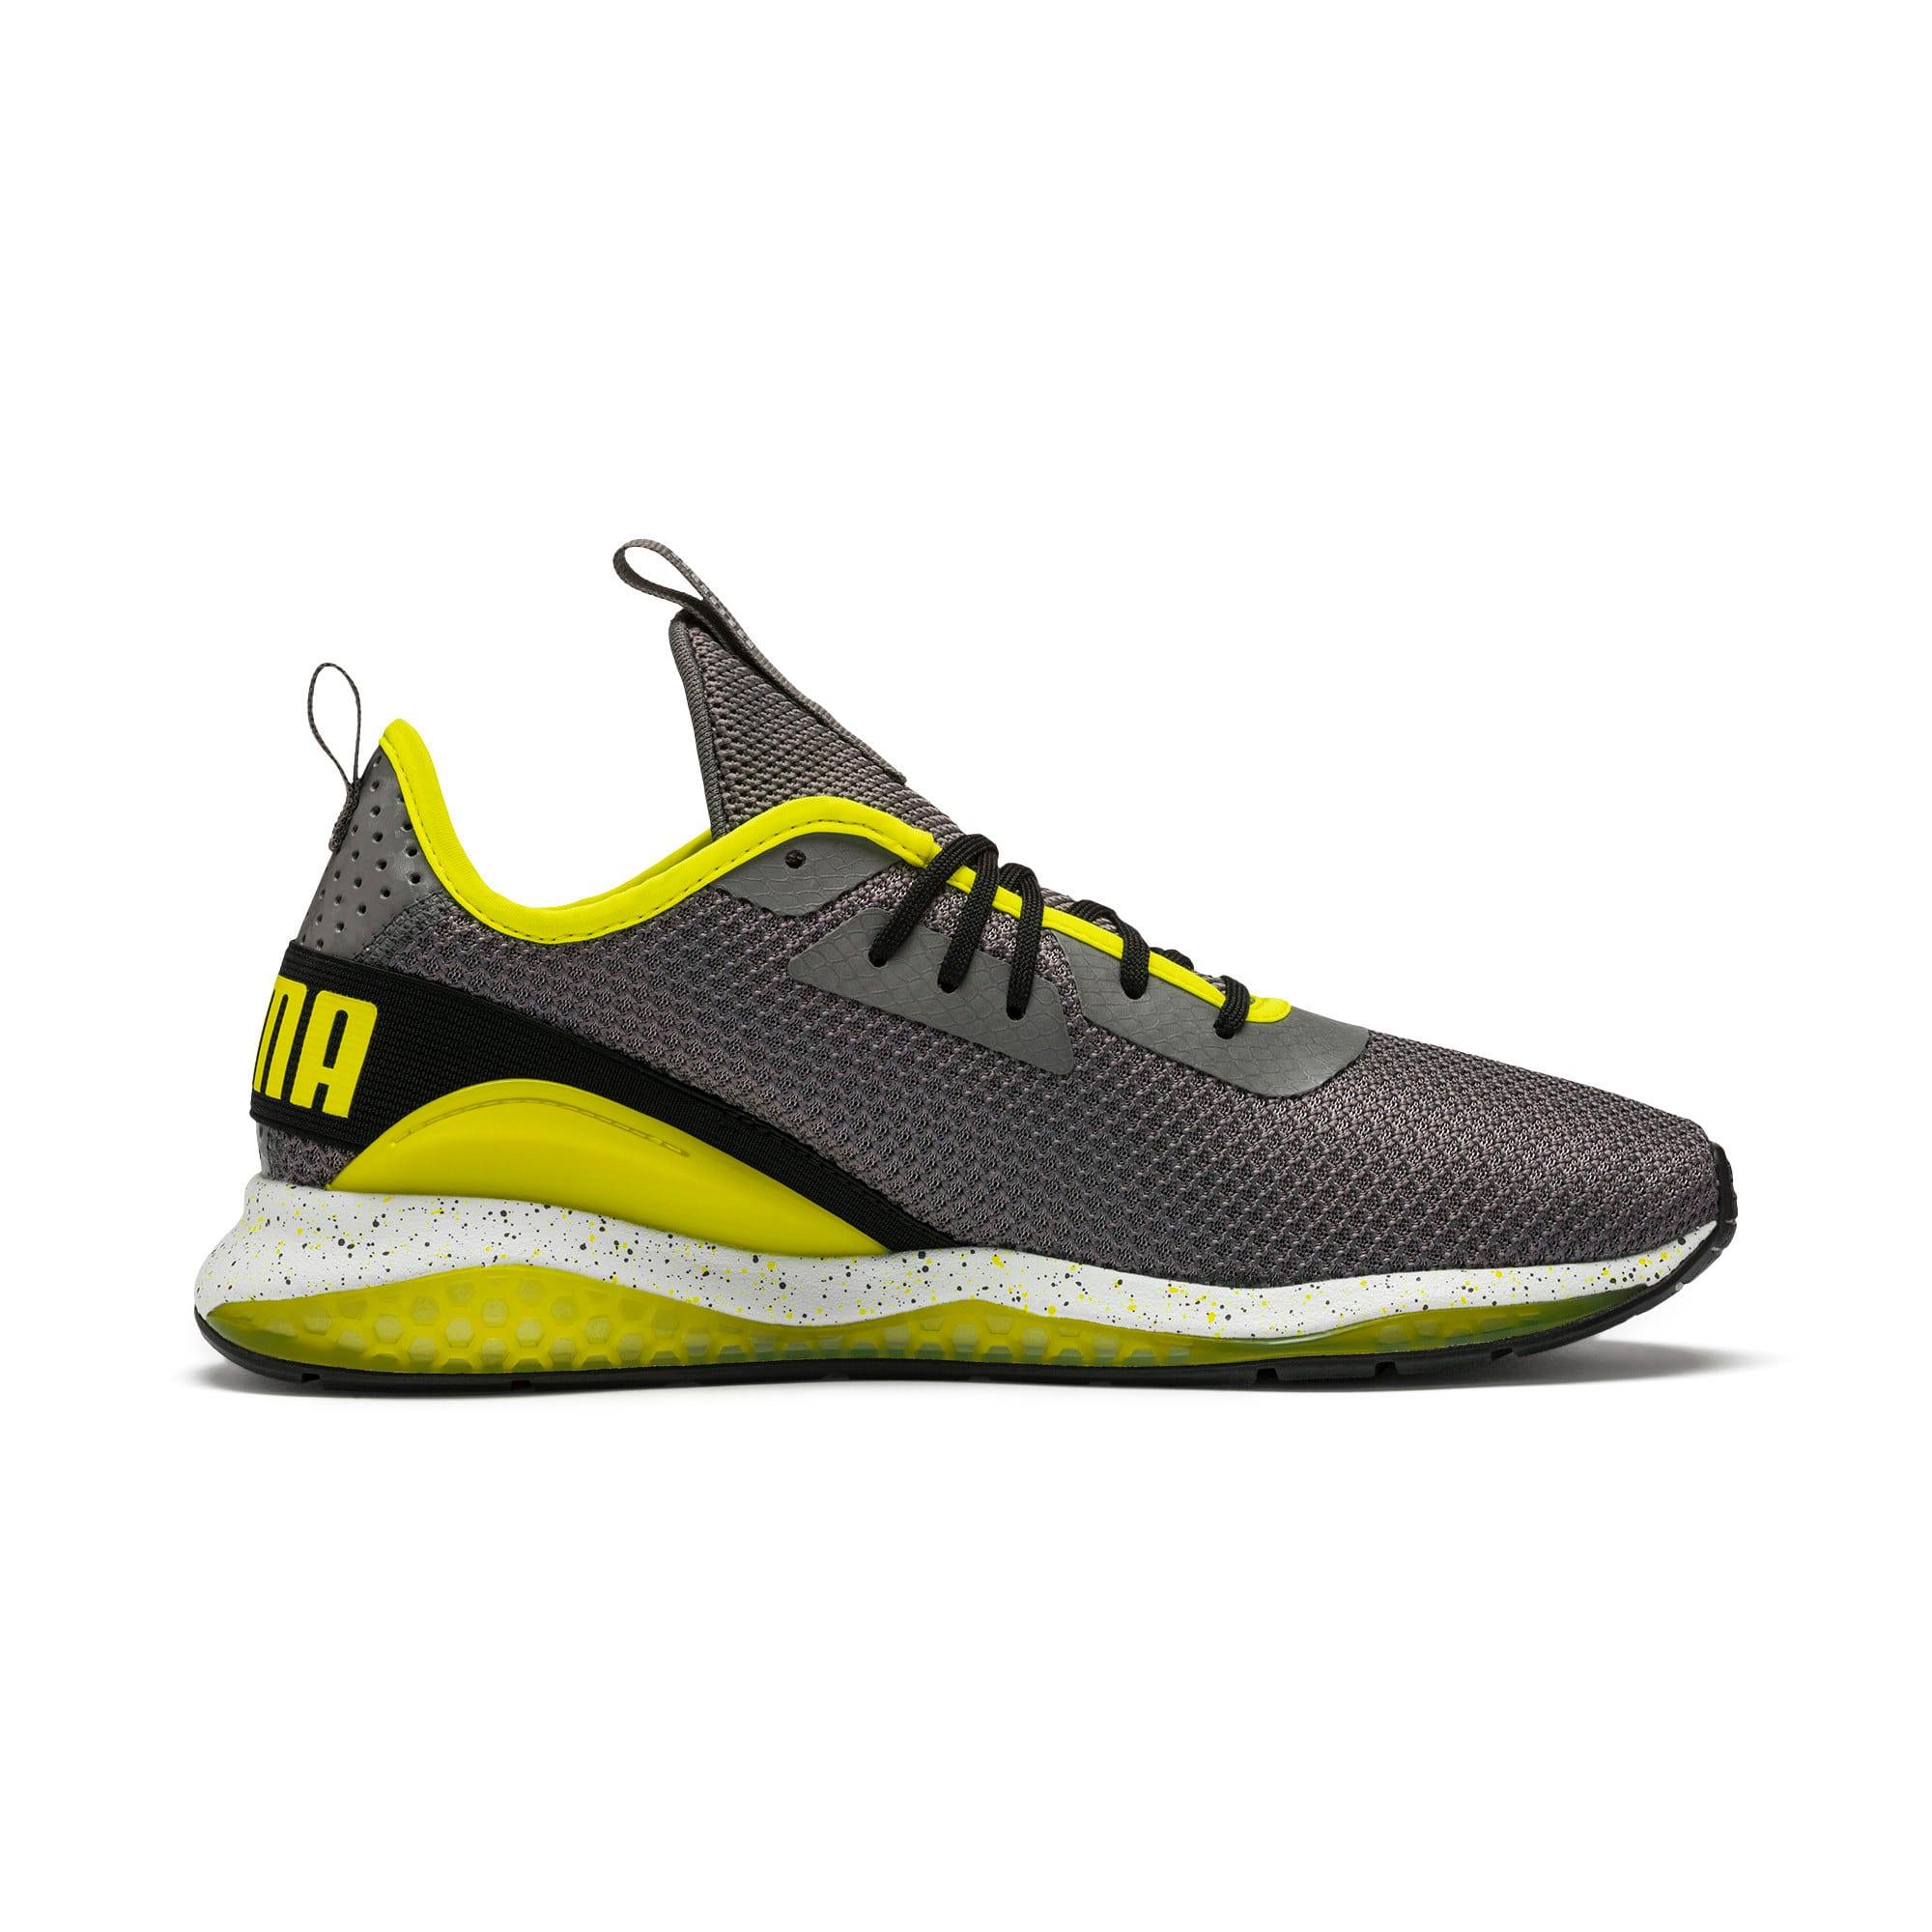 Thumbnail 6 of CELL Descend Weave Men's Training Shoes, CASTLEROCK-Black-Yellow, medium